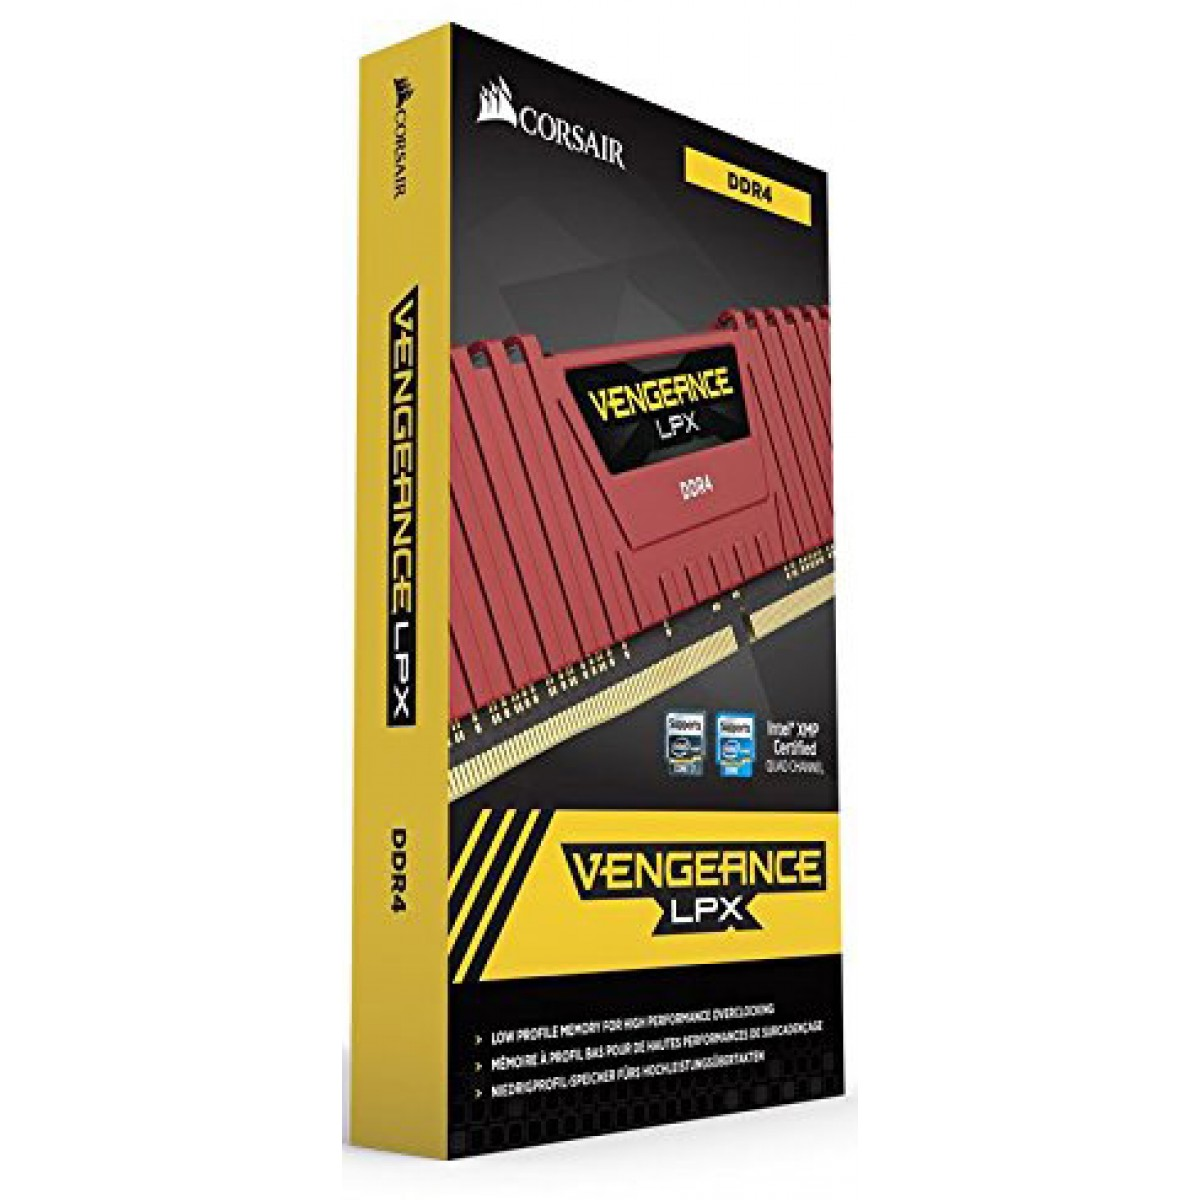 Memória DDR4 Corsair Vengeance LPX CMK8GX4M2A2133C13R 8GB (2x4GB) 2133MHz Red